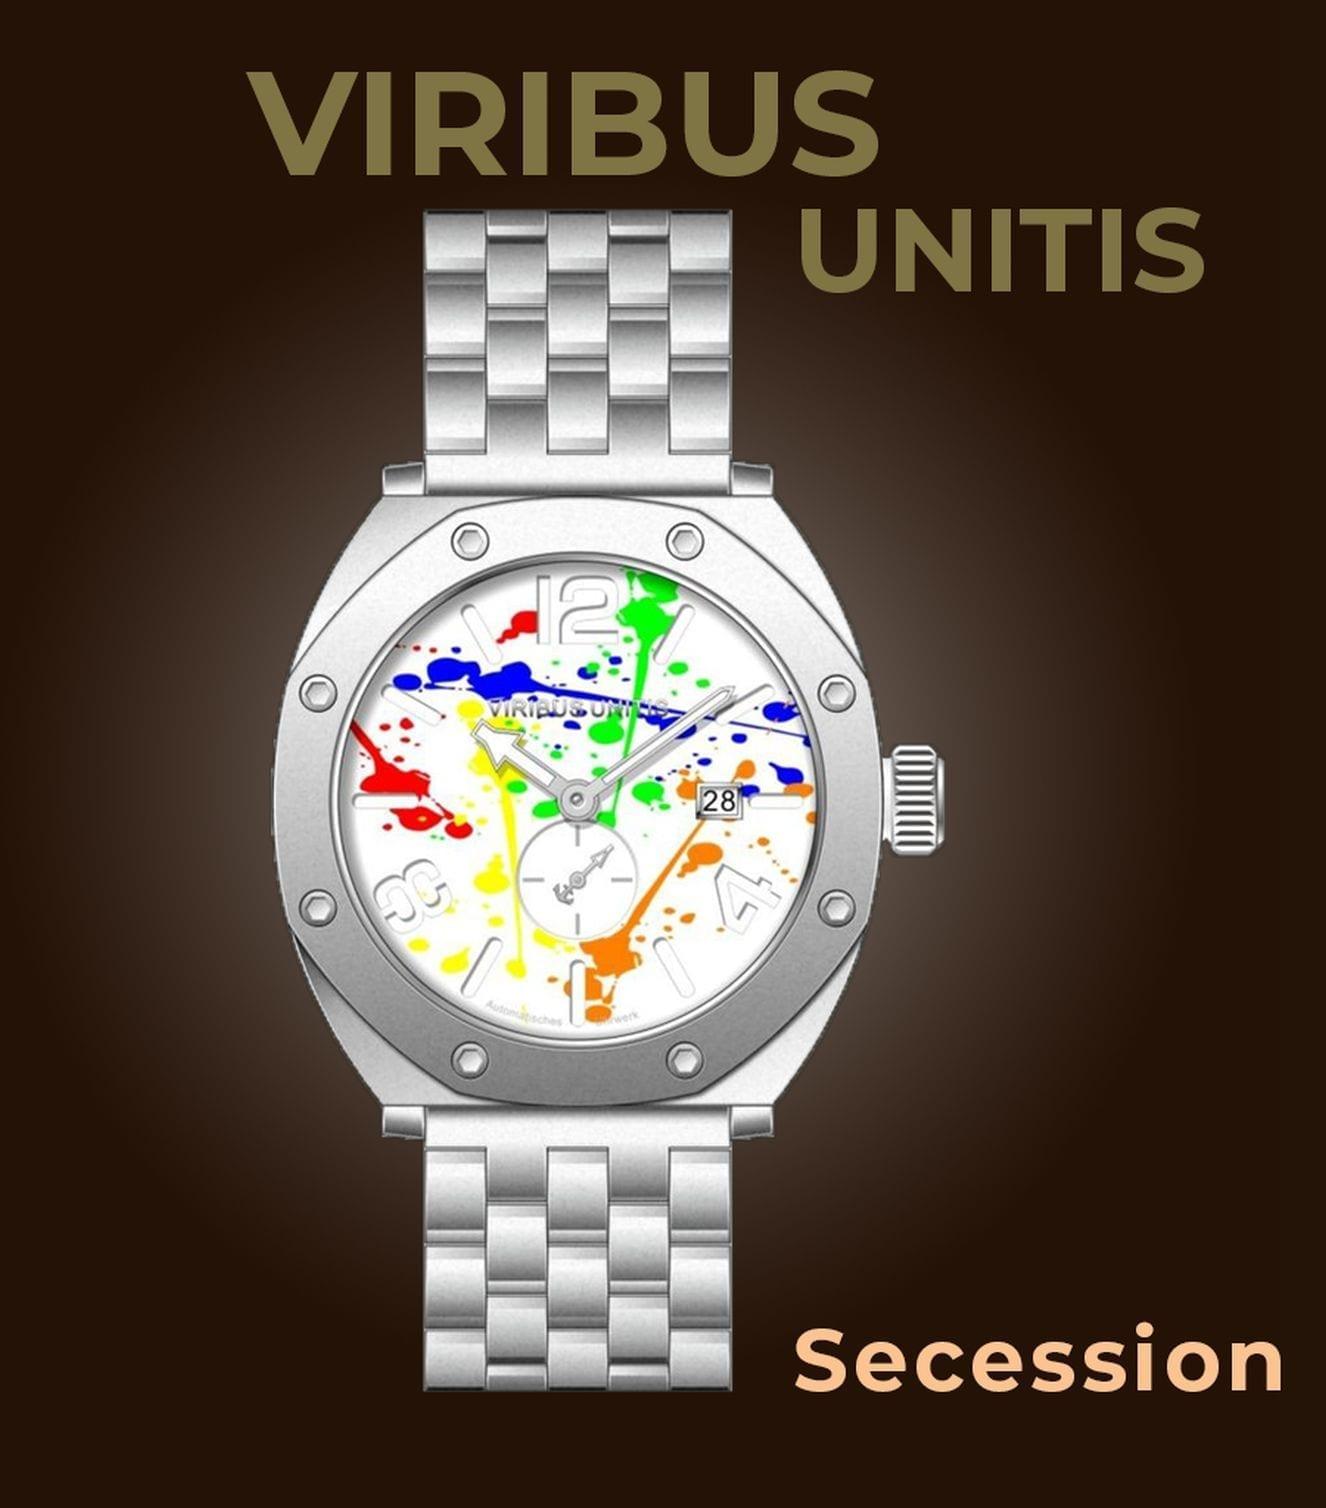 Viribus Unitis Watches Modell Secession